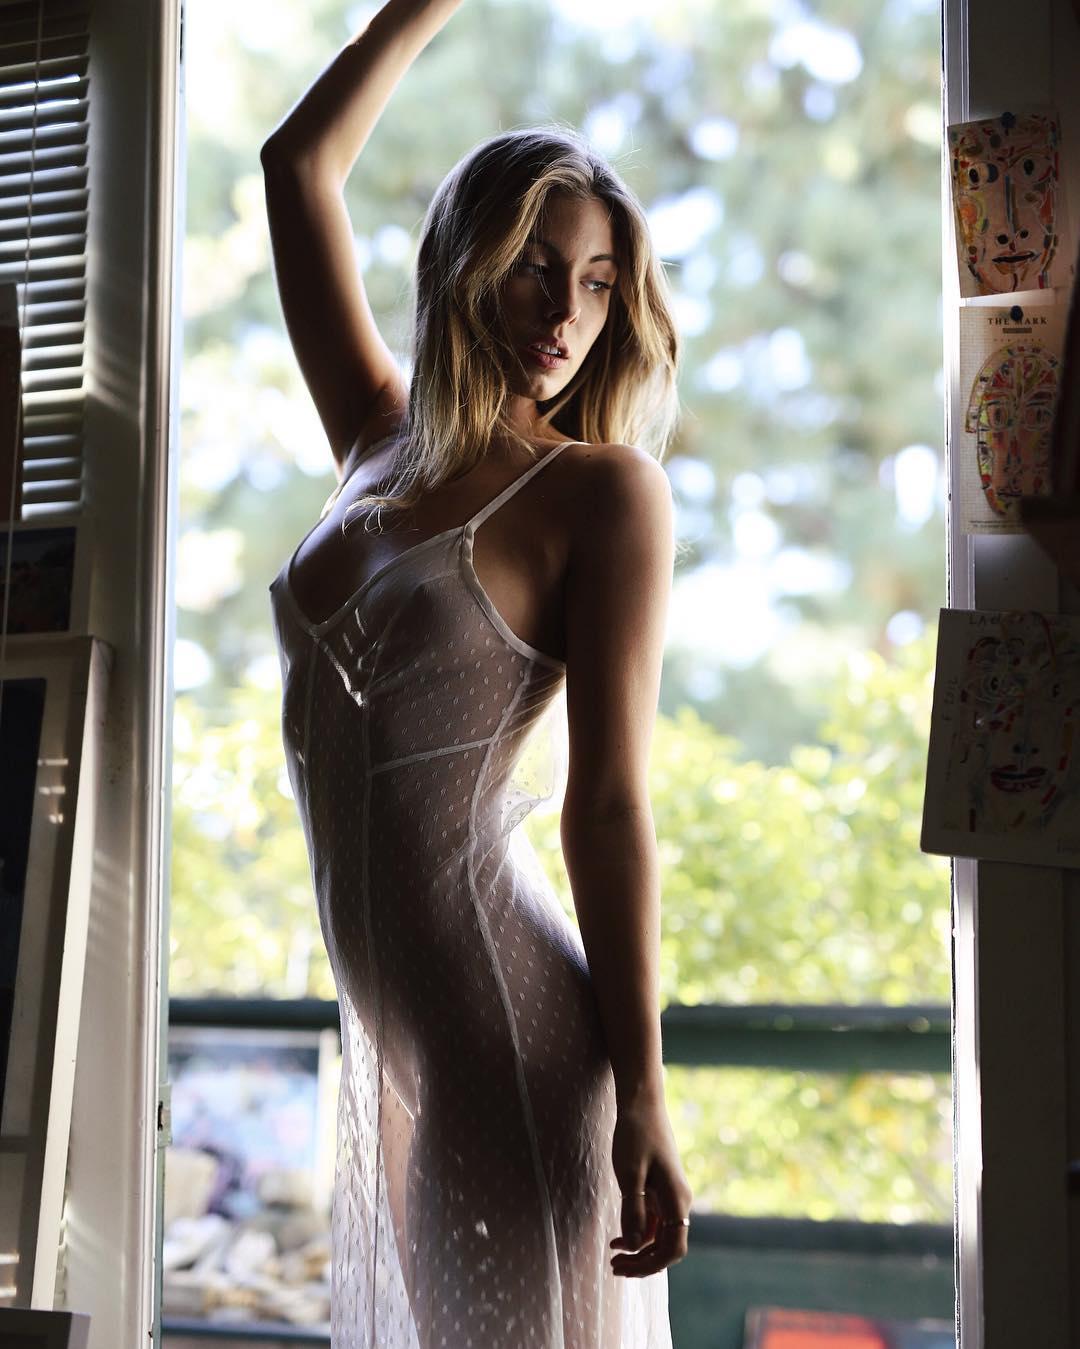 Carmella Rose nudes (82 photos) Feet, YouTube, legs